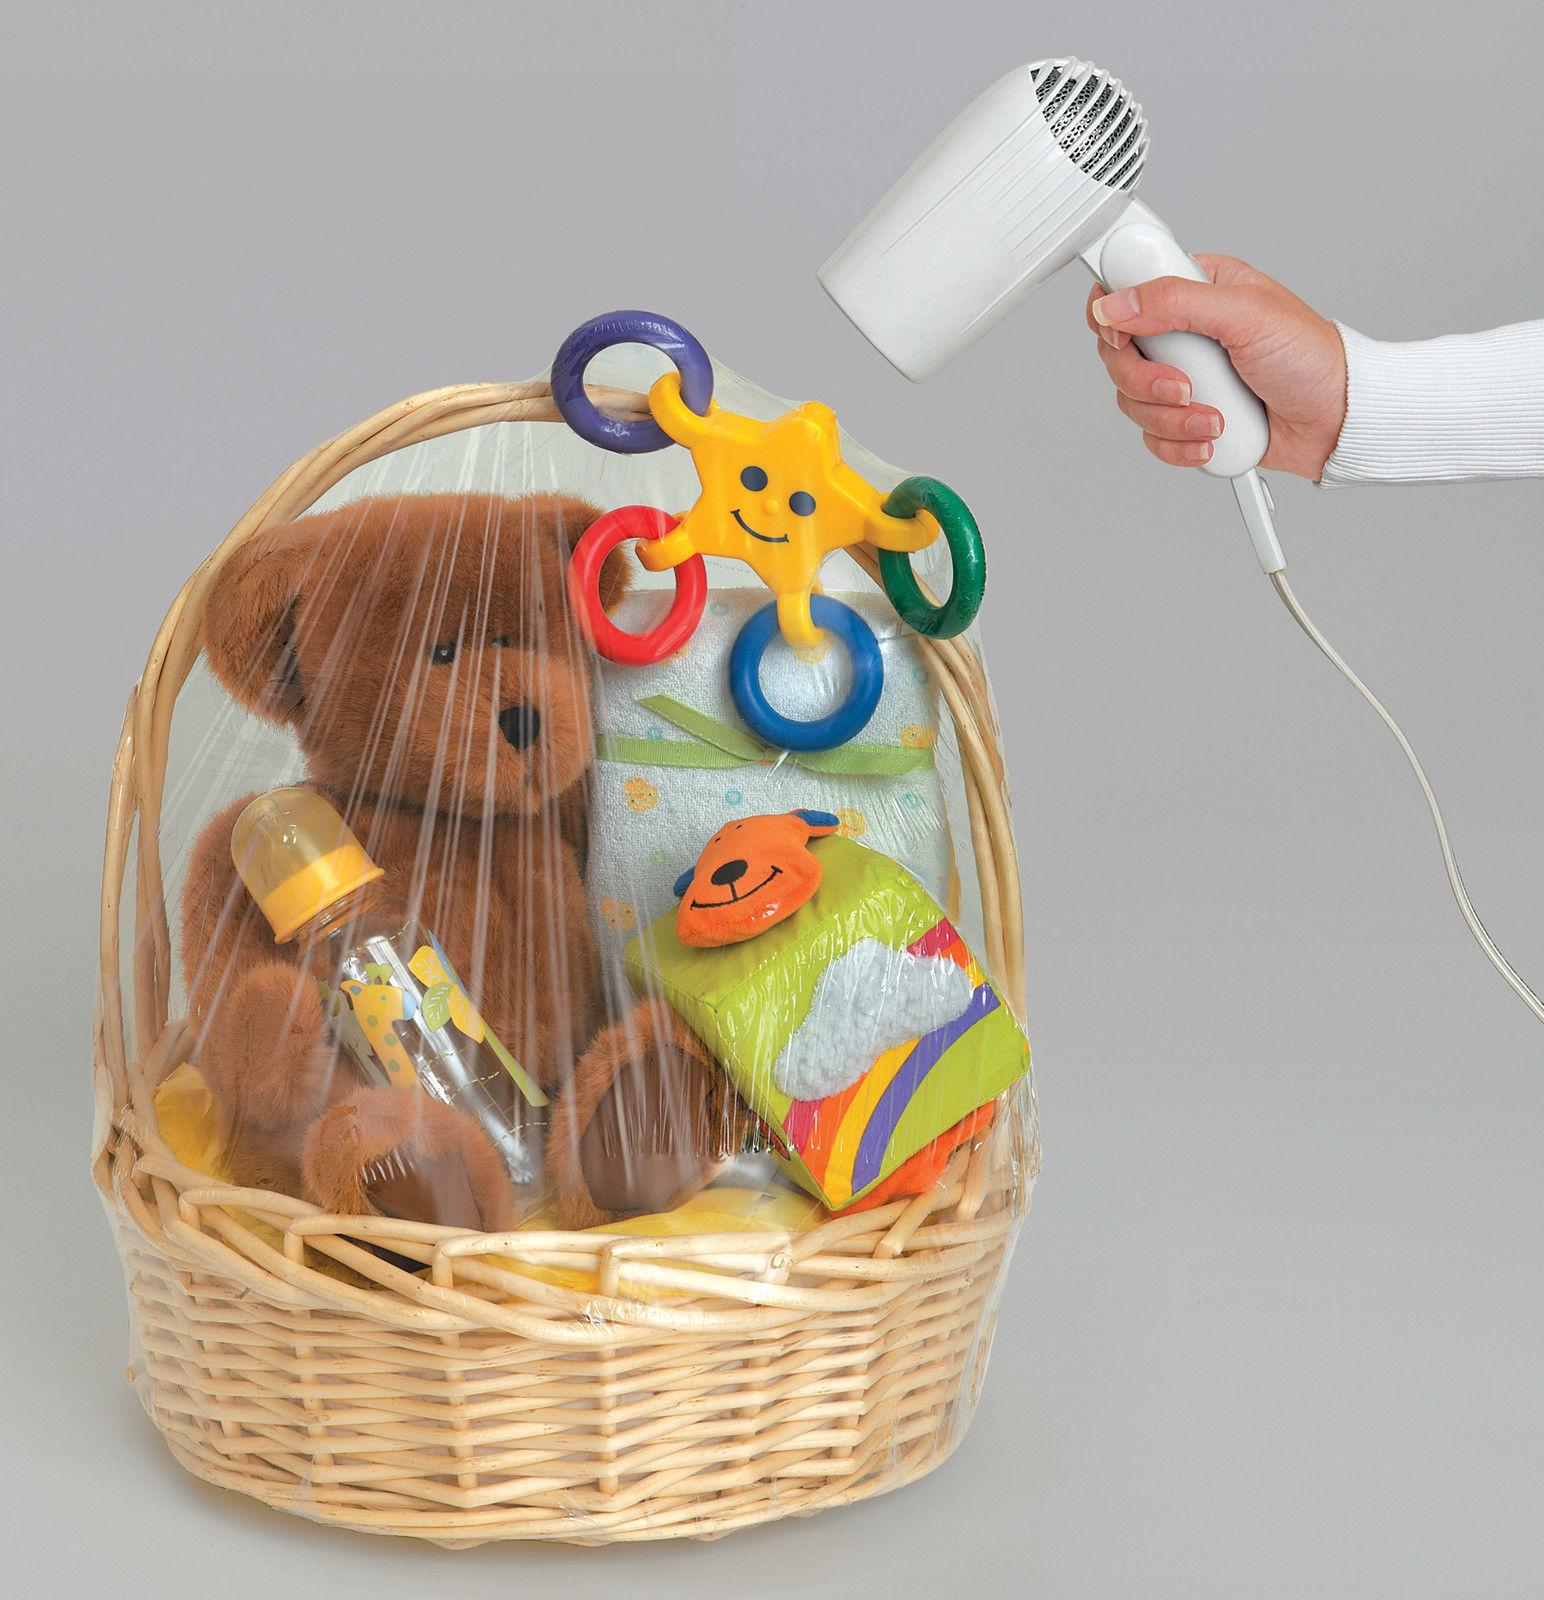 Bridal Shower Gift Basket Climbing On House Halloween: Hamper Wrap Cellophane Basket Gift Wrap Bag Large Cello